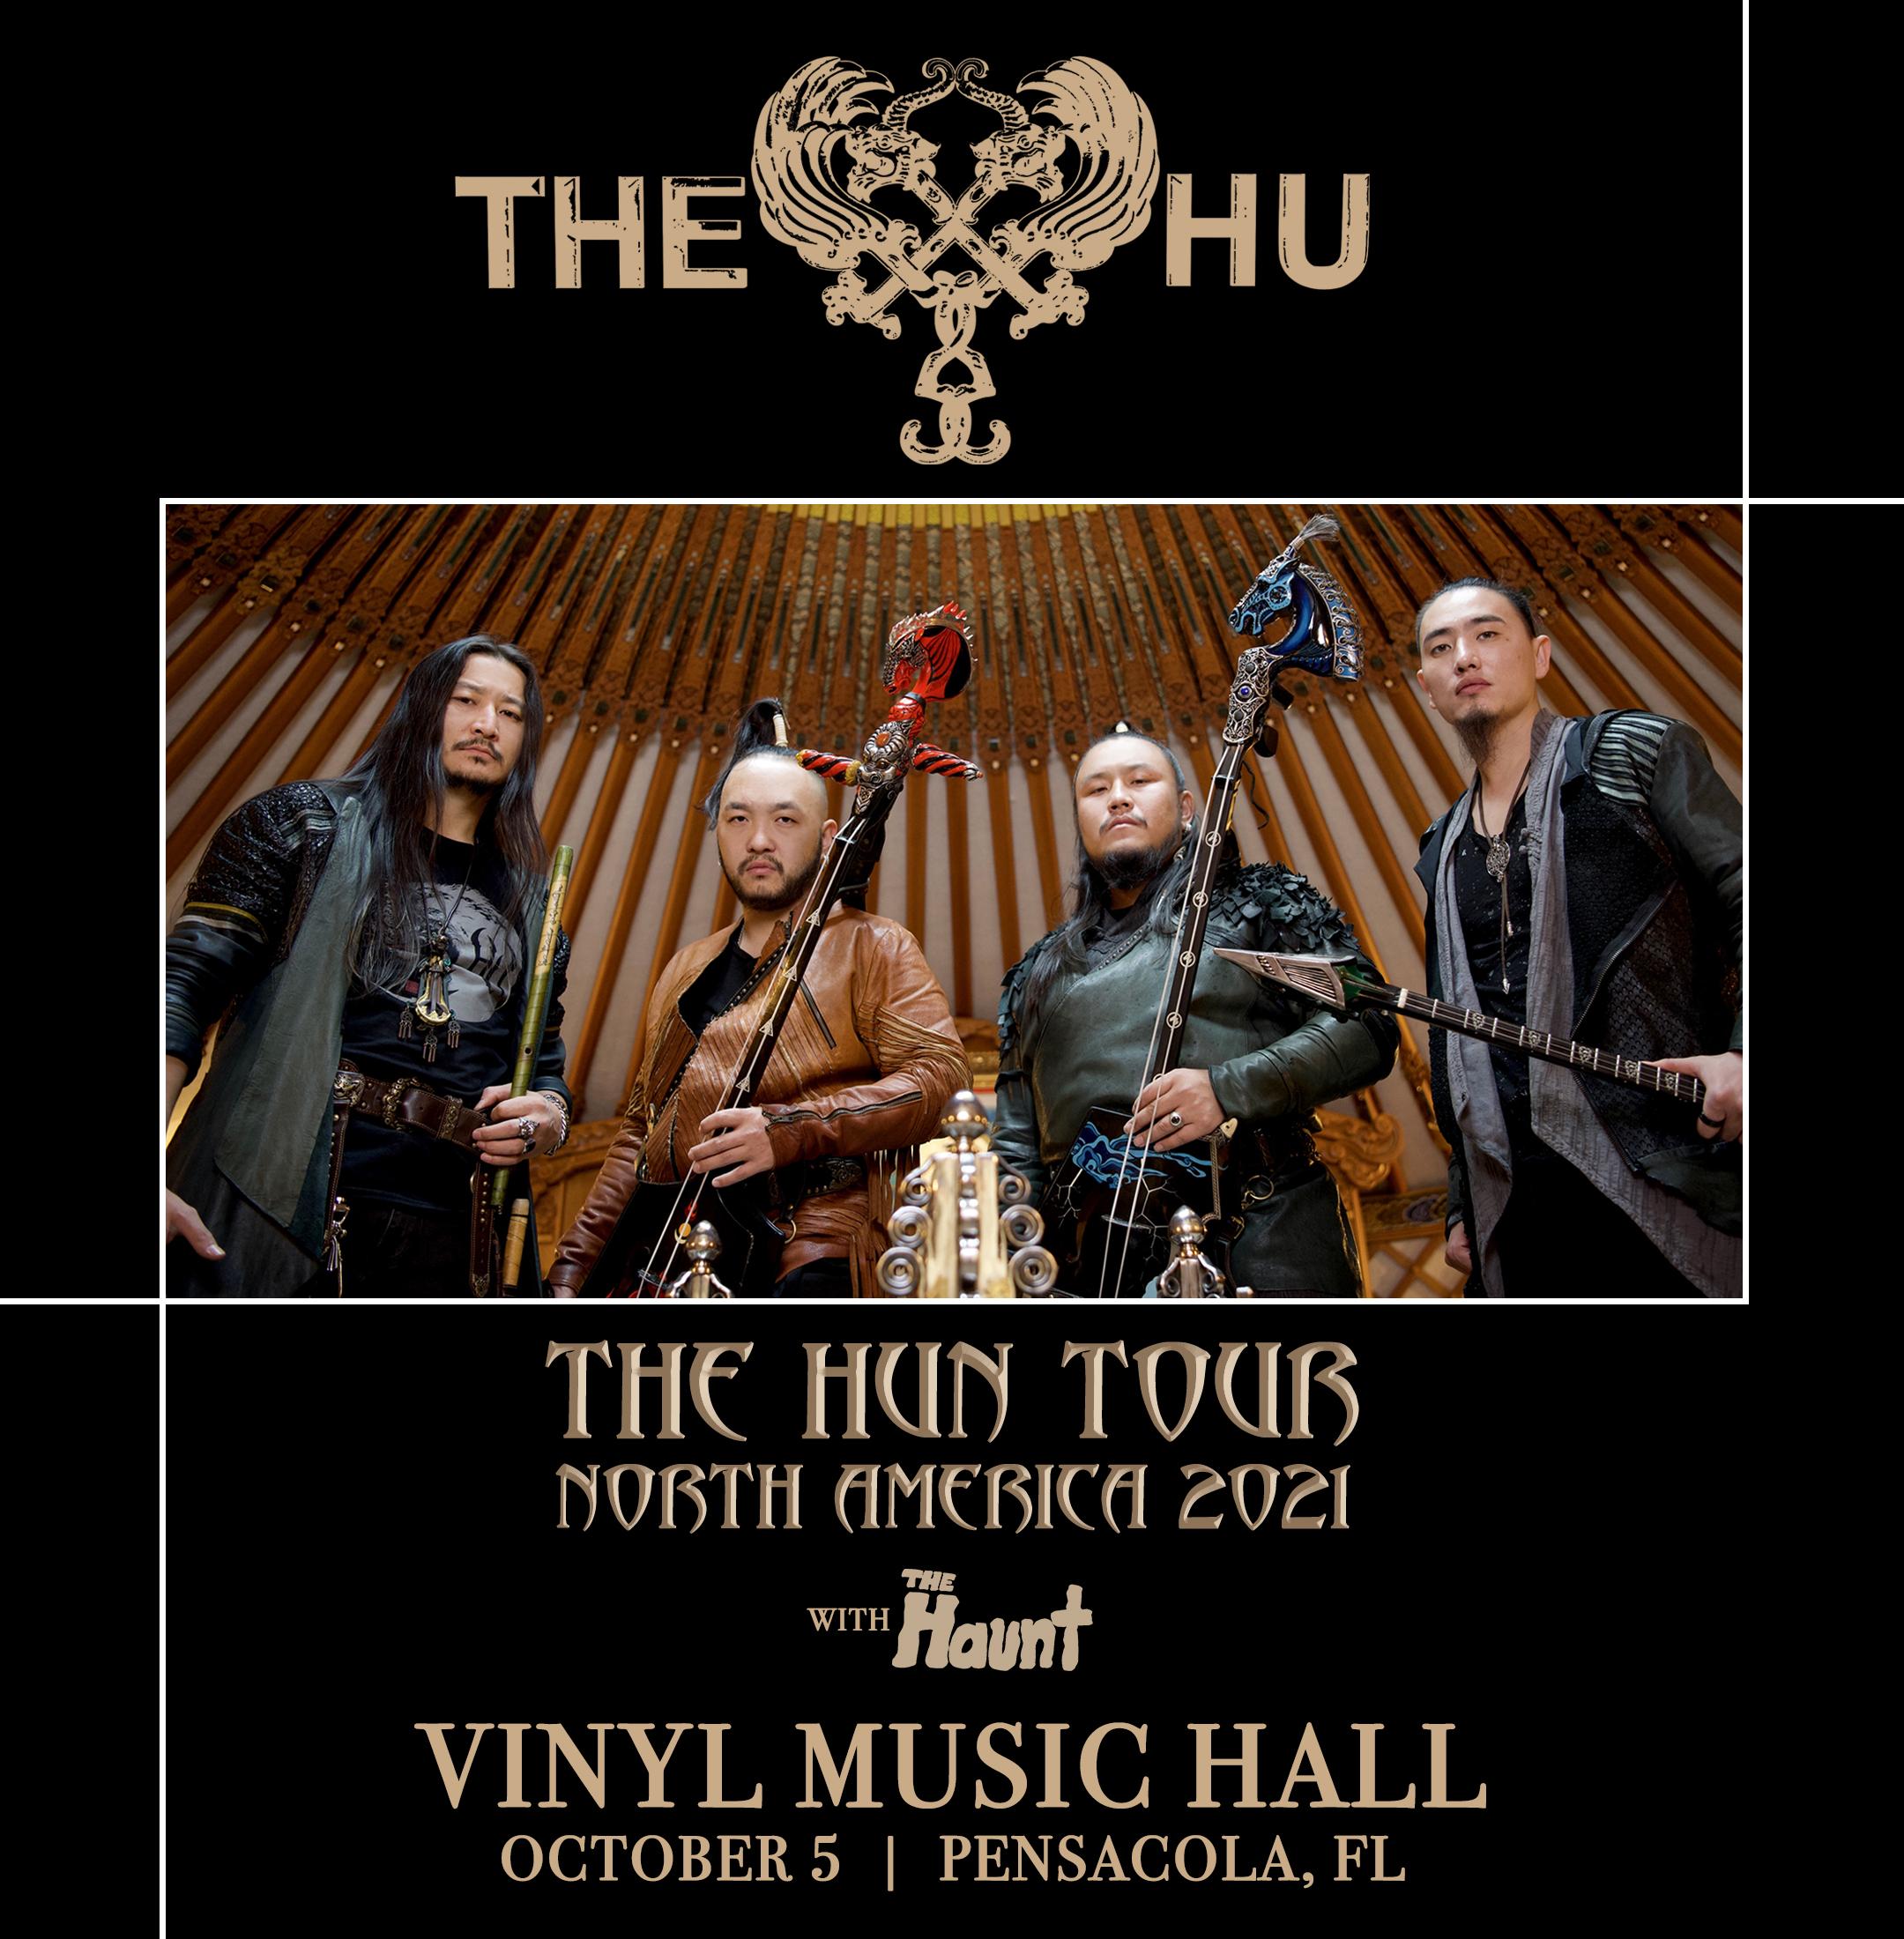 THE HU - The Hun Tour: